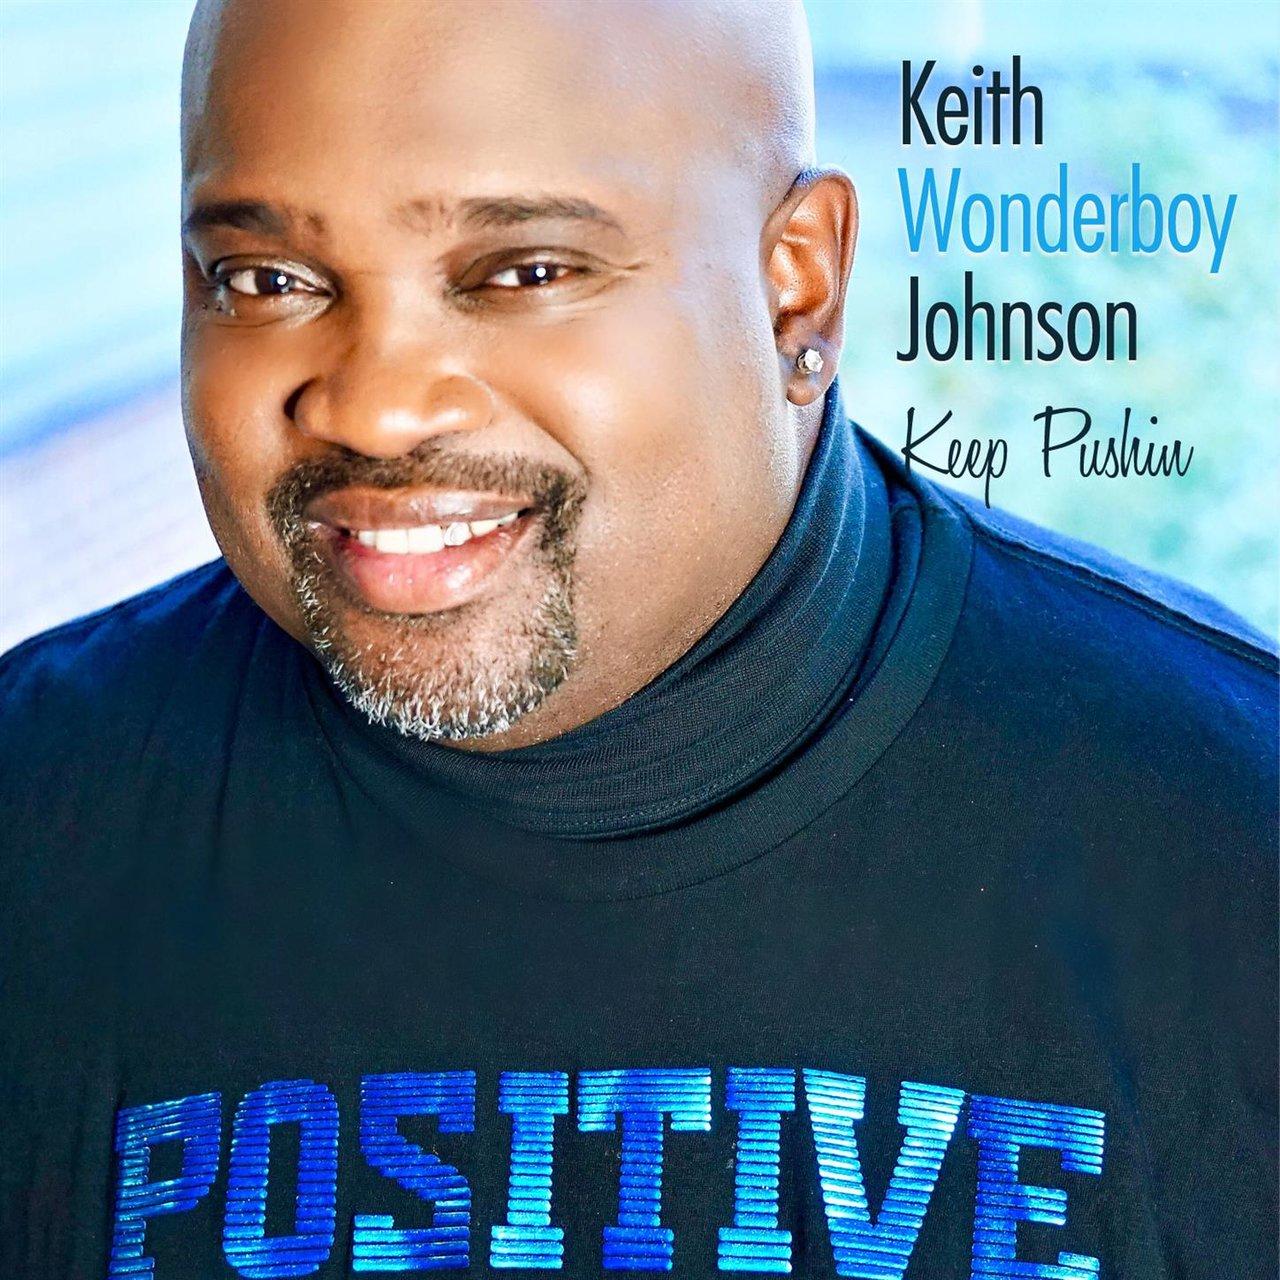 keep pushin keep pushin keep pushin keith wonderboy johnson